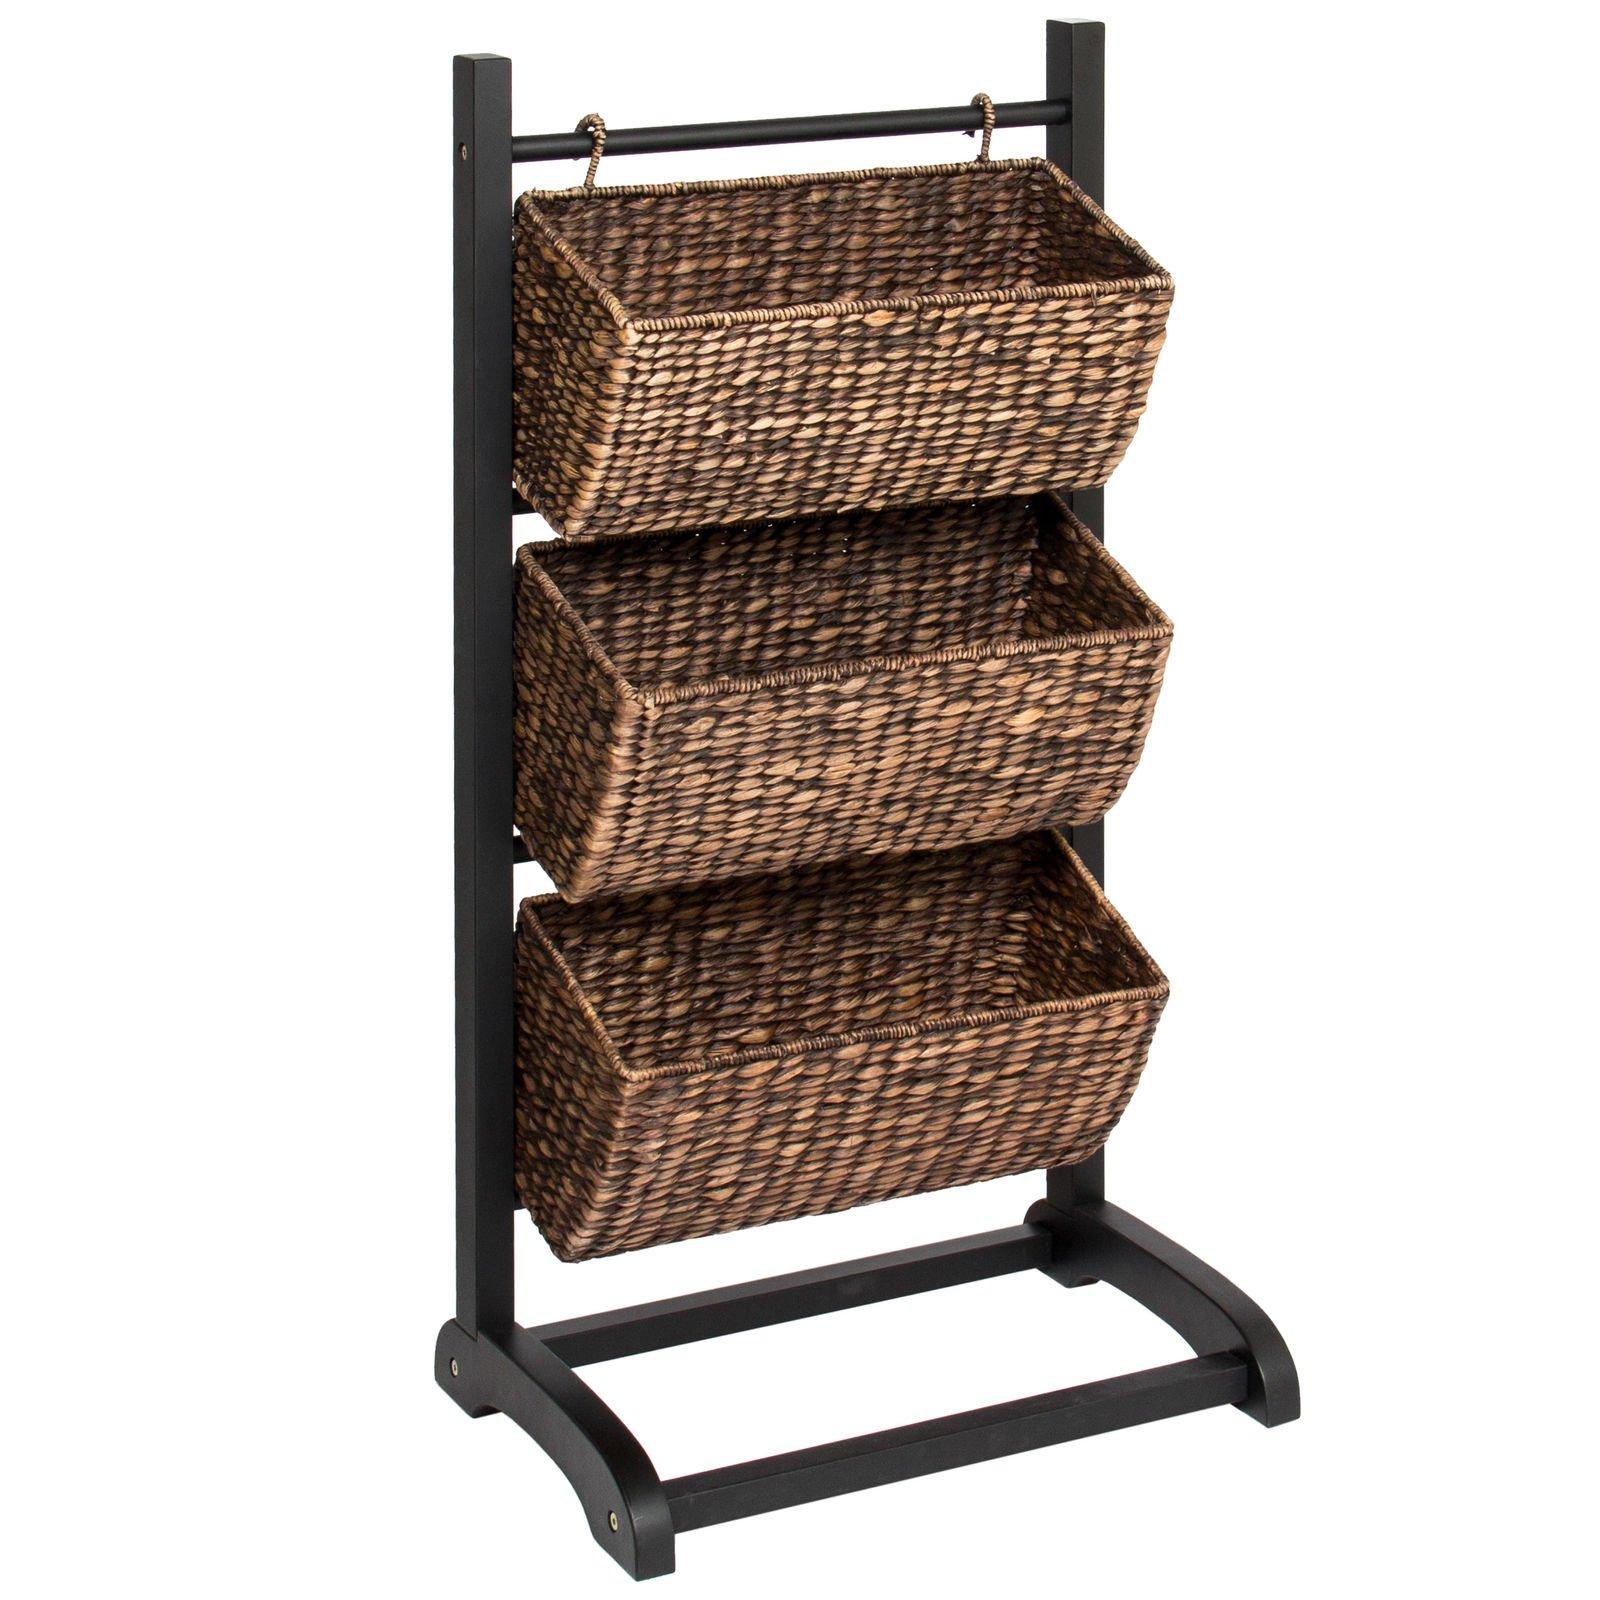 Water Hyacinth 3 Tier Storage Cubby Metal Shelf W/ Bonus Basket-Brushed Espresso